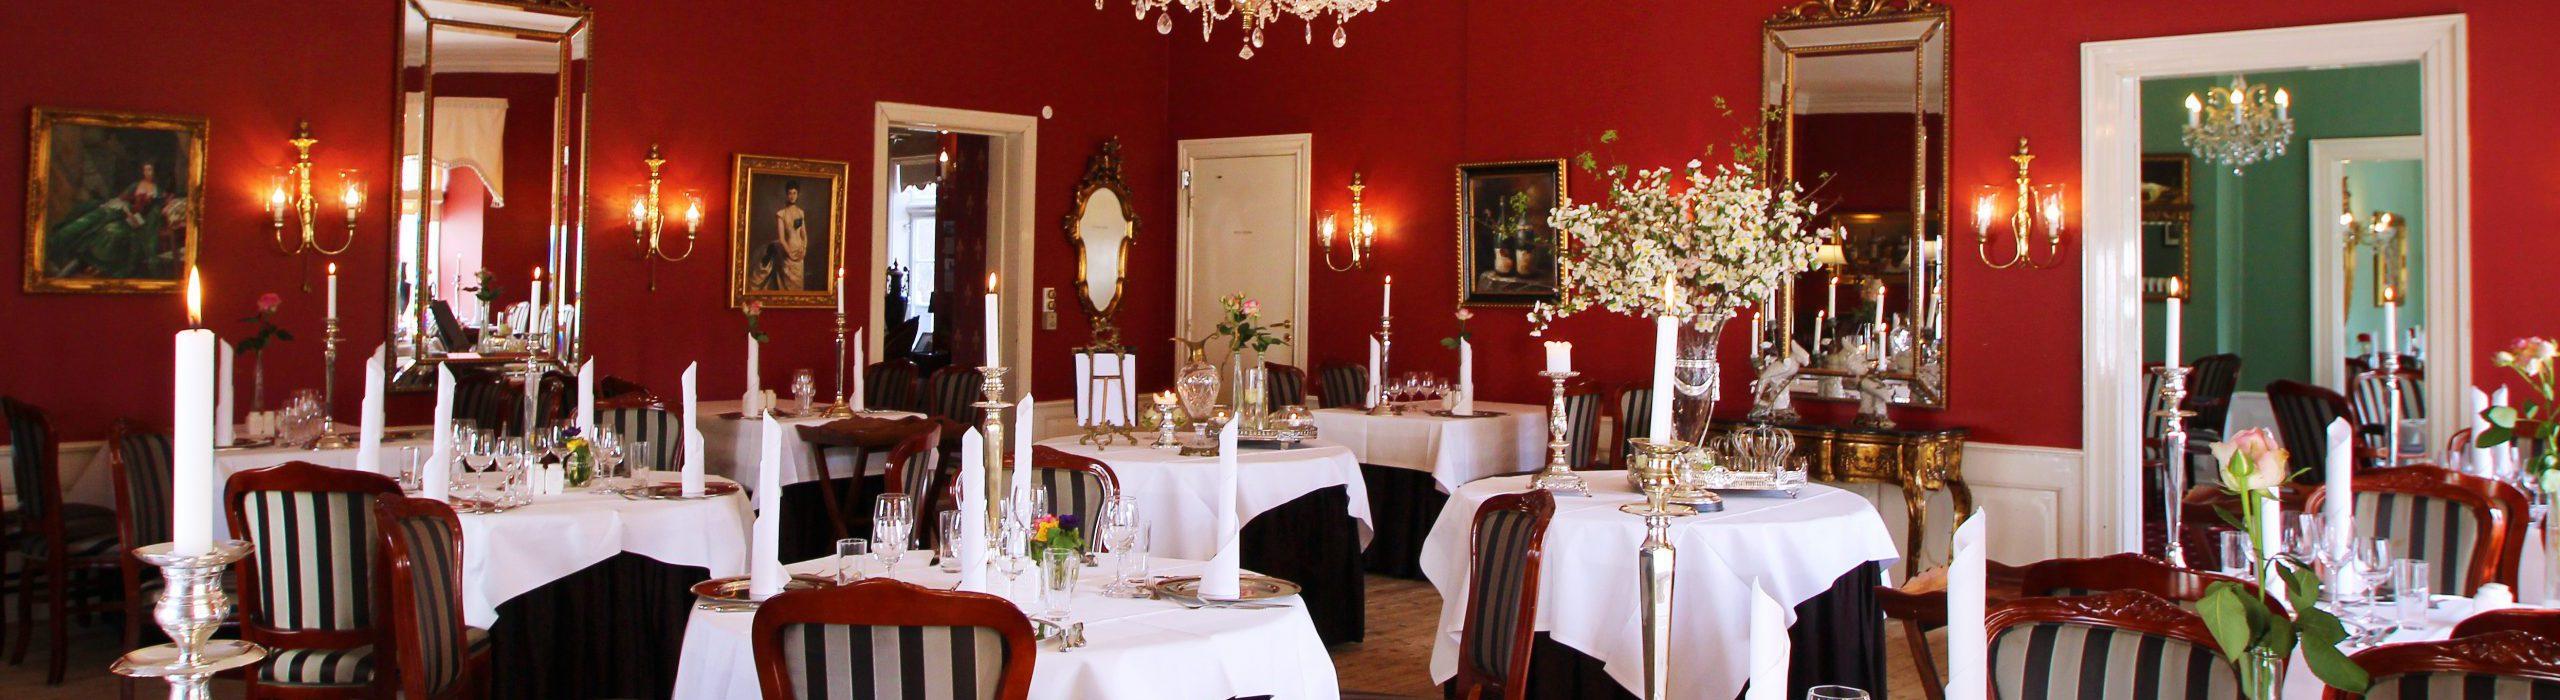 Store Restrup Herregård Restaurant